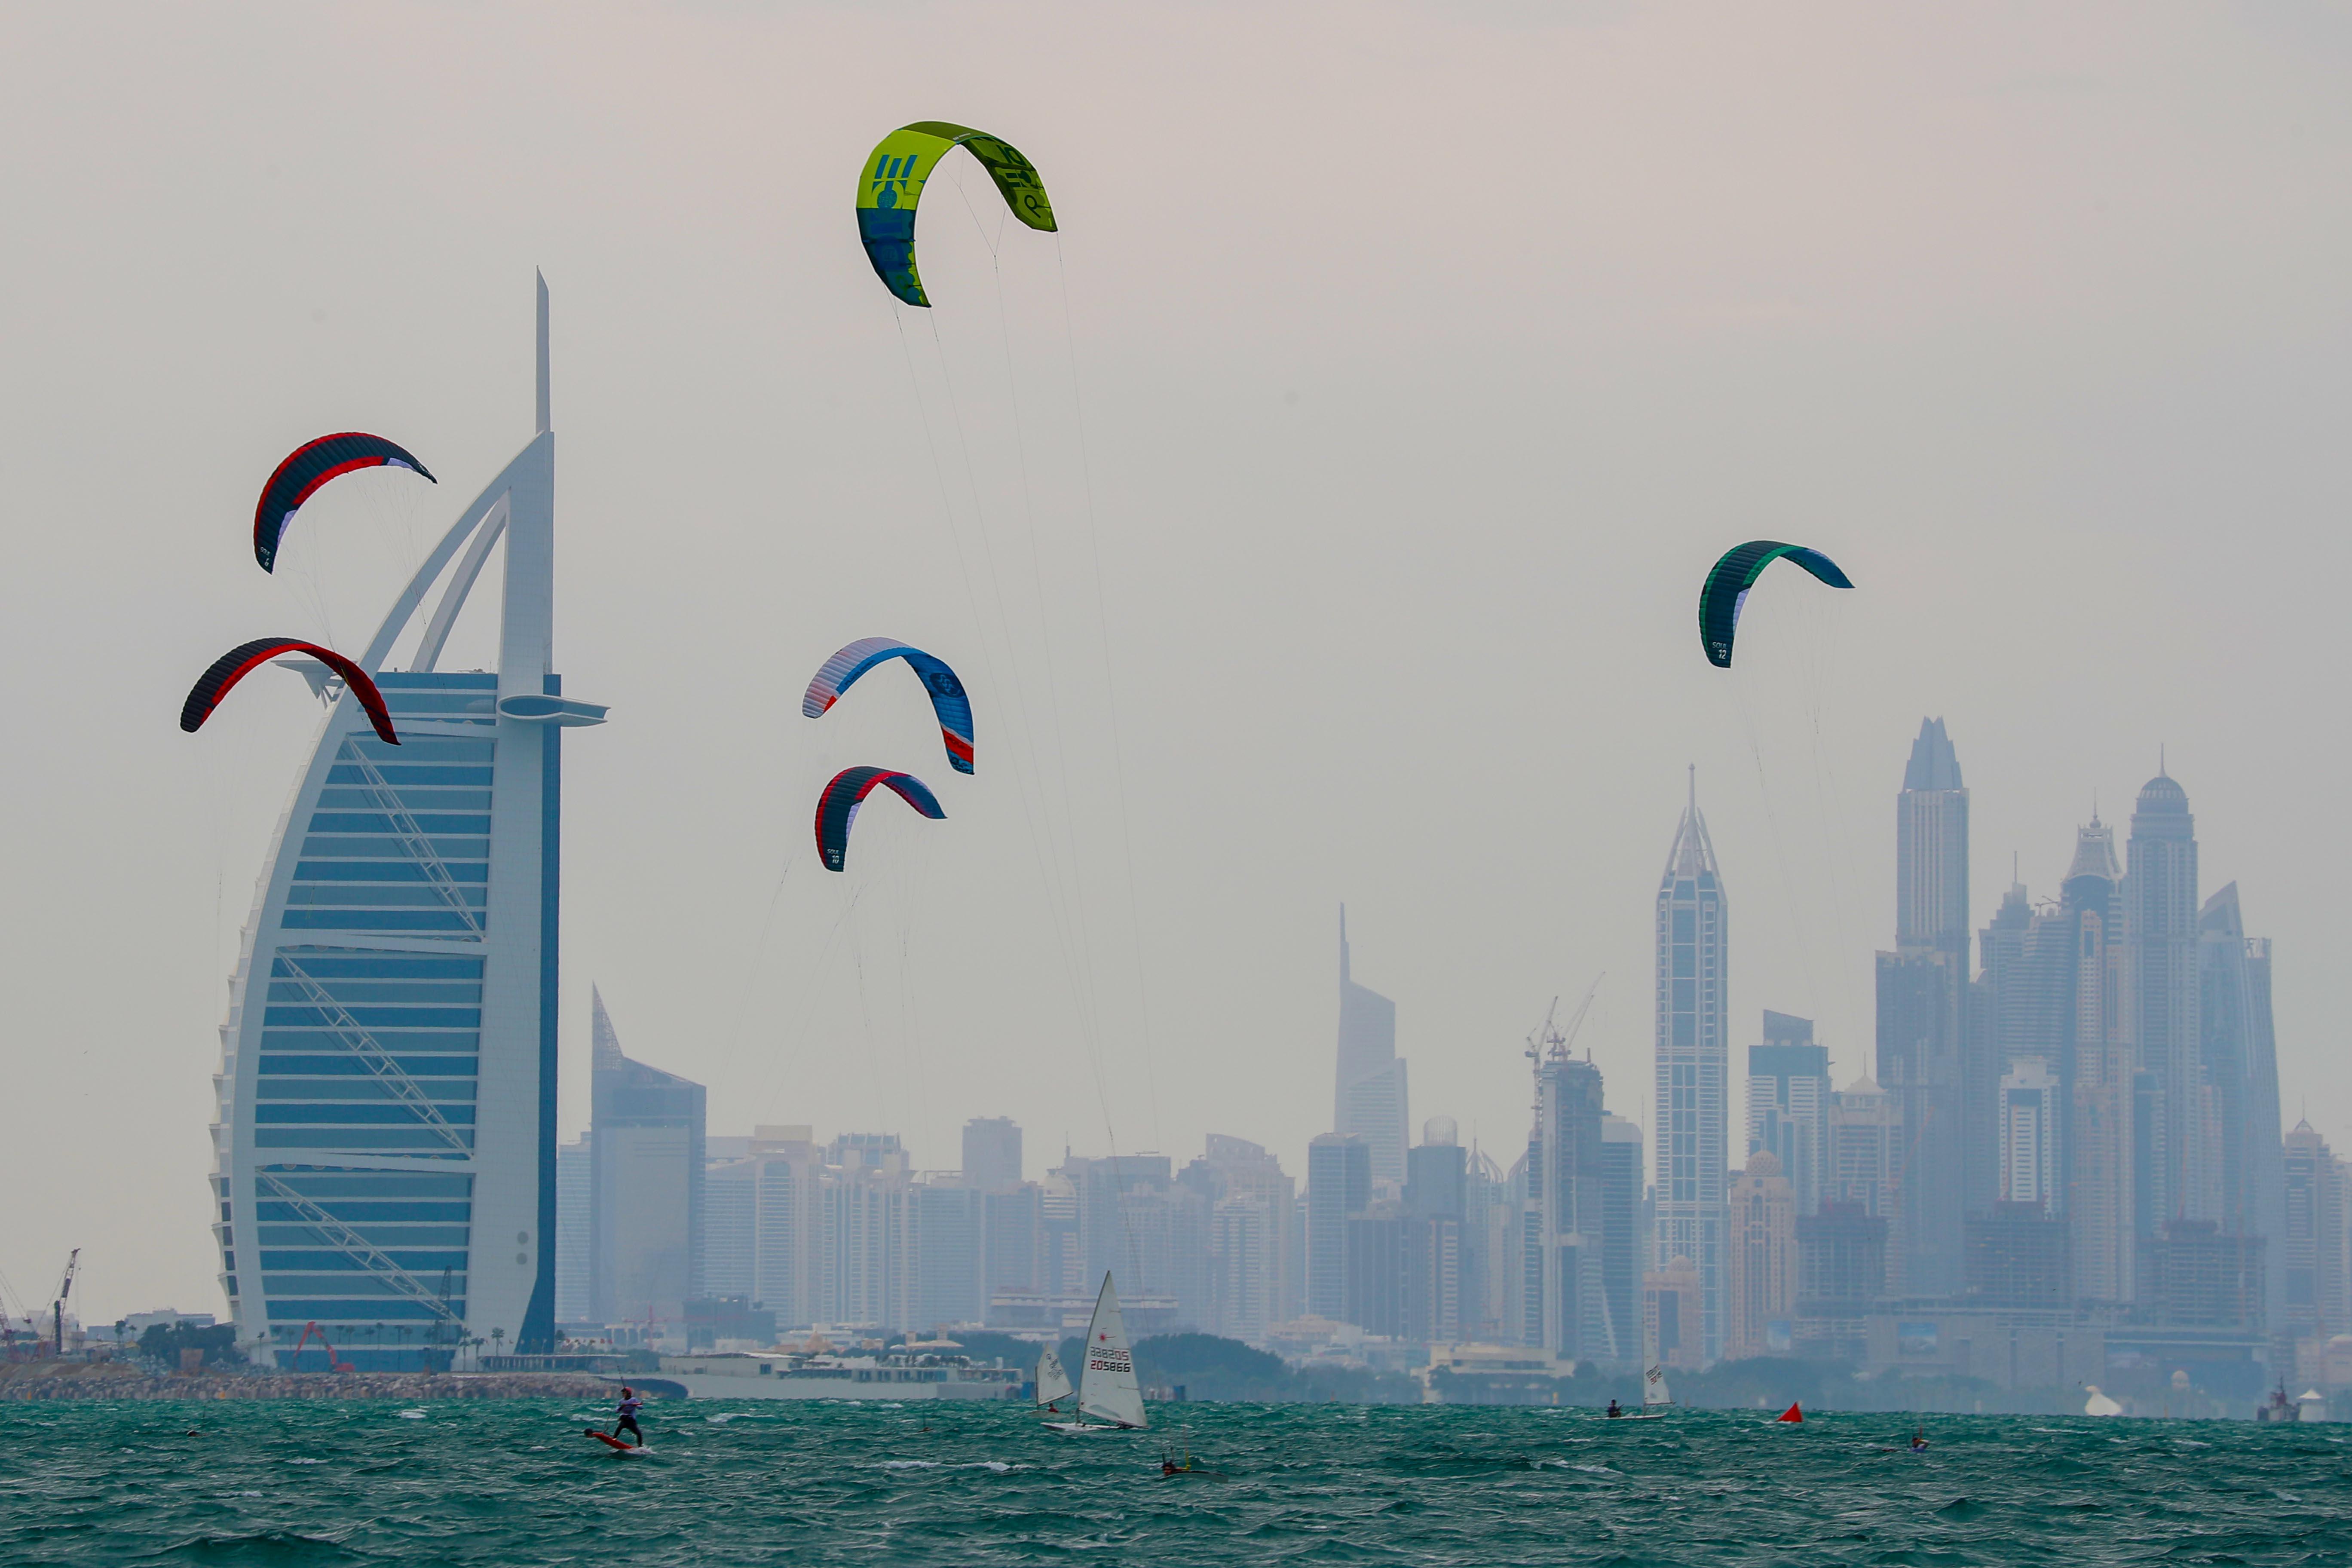 Marine Sport Races fills Jumeirah Beach this week